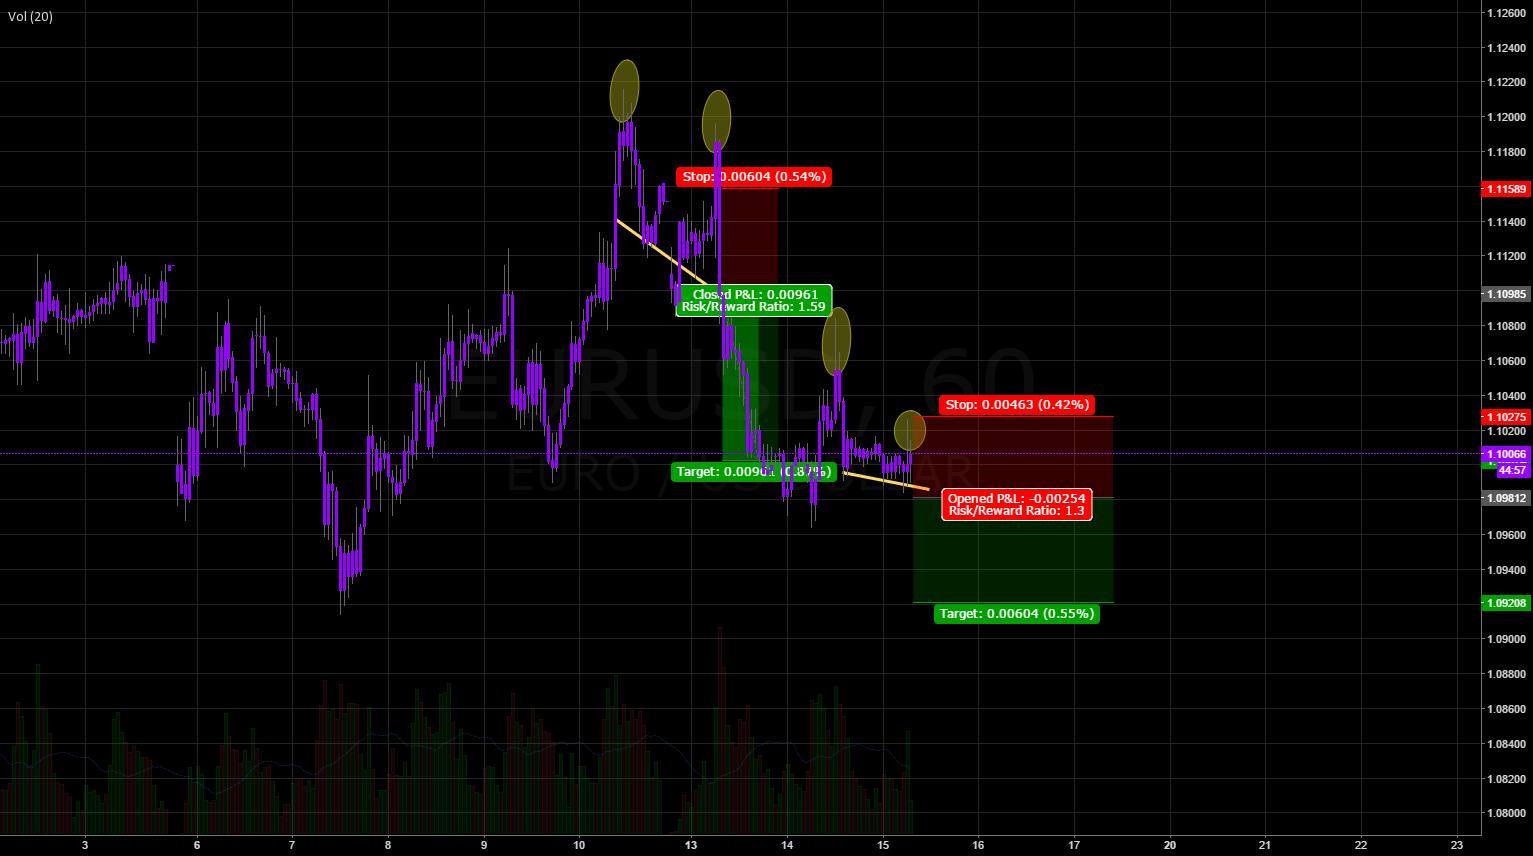 EURUSD Short, Yellow Line Break